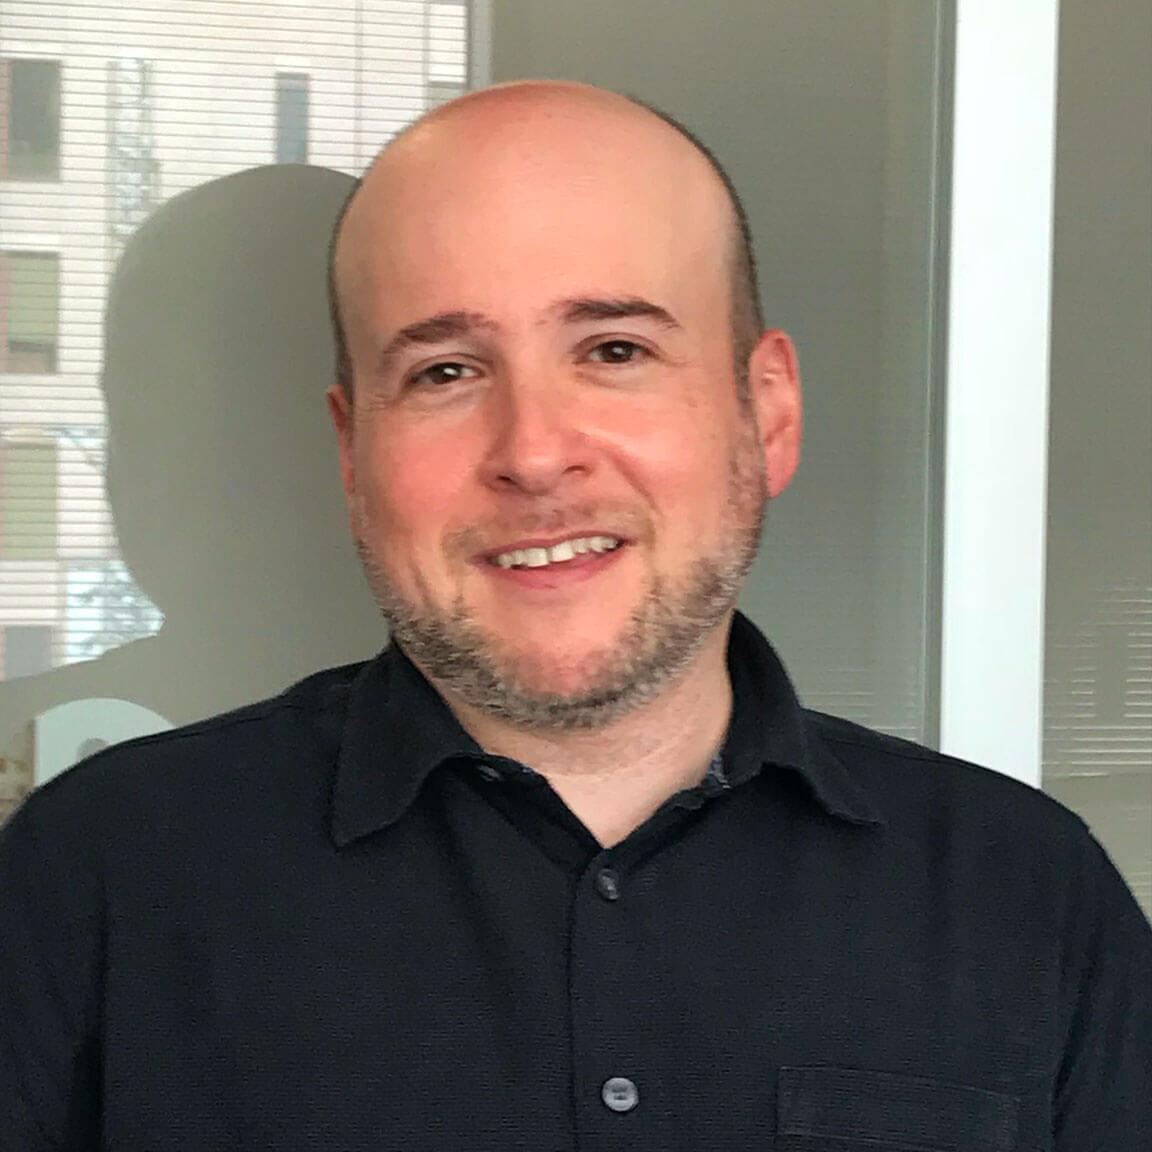 Marc Altshuller